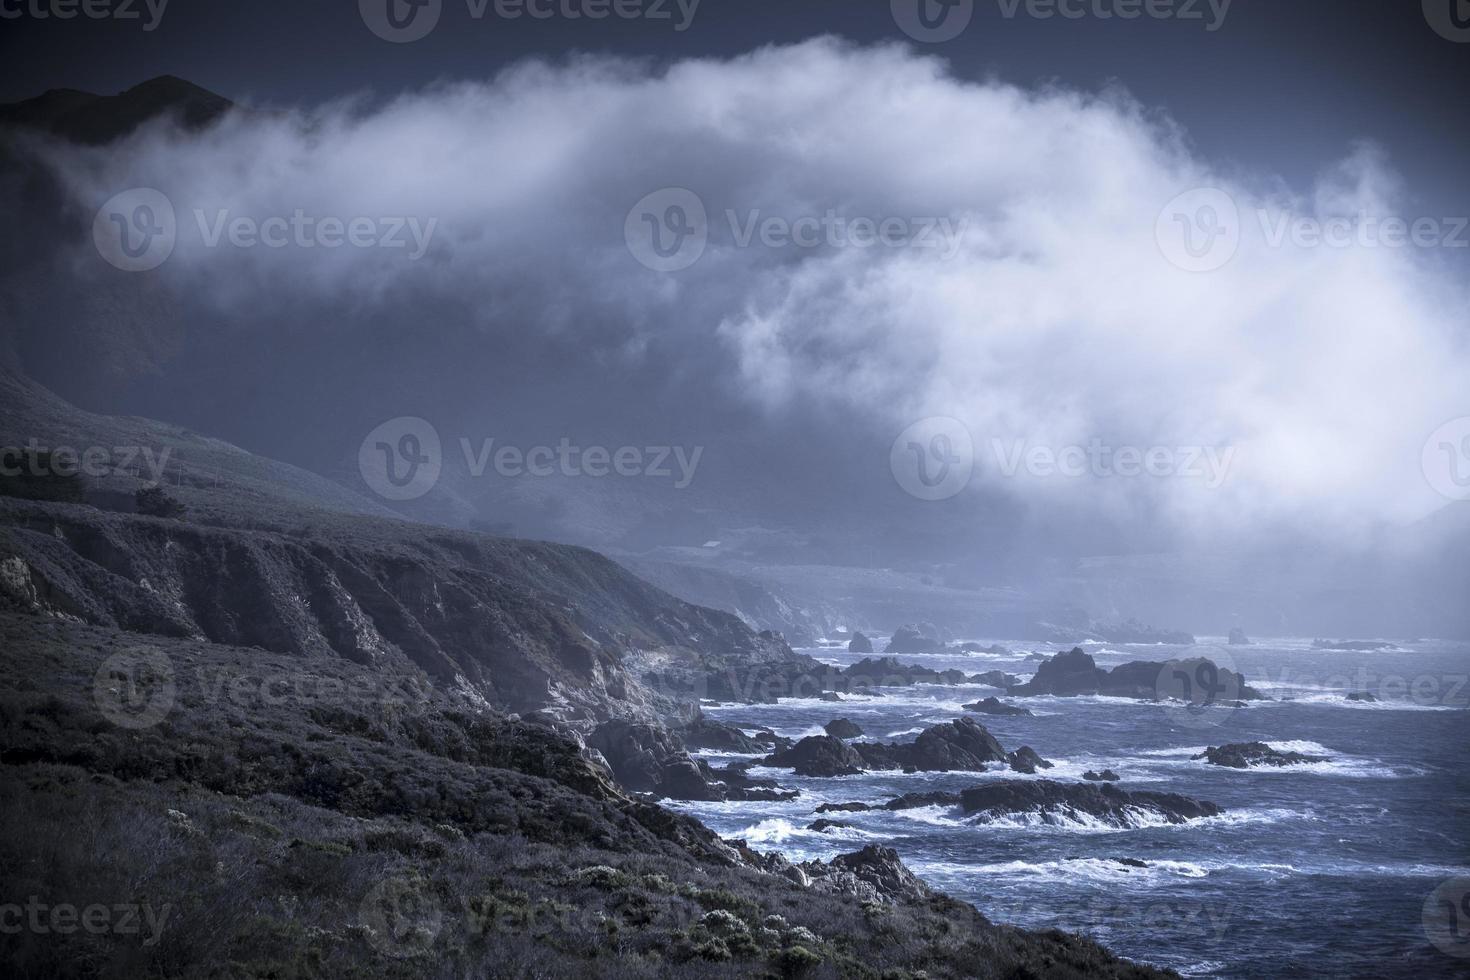 USA, California, Big Sur, Coastline and sea photo